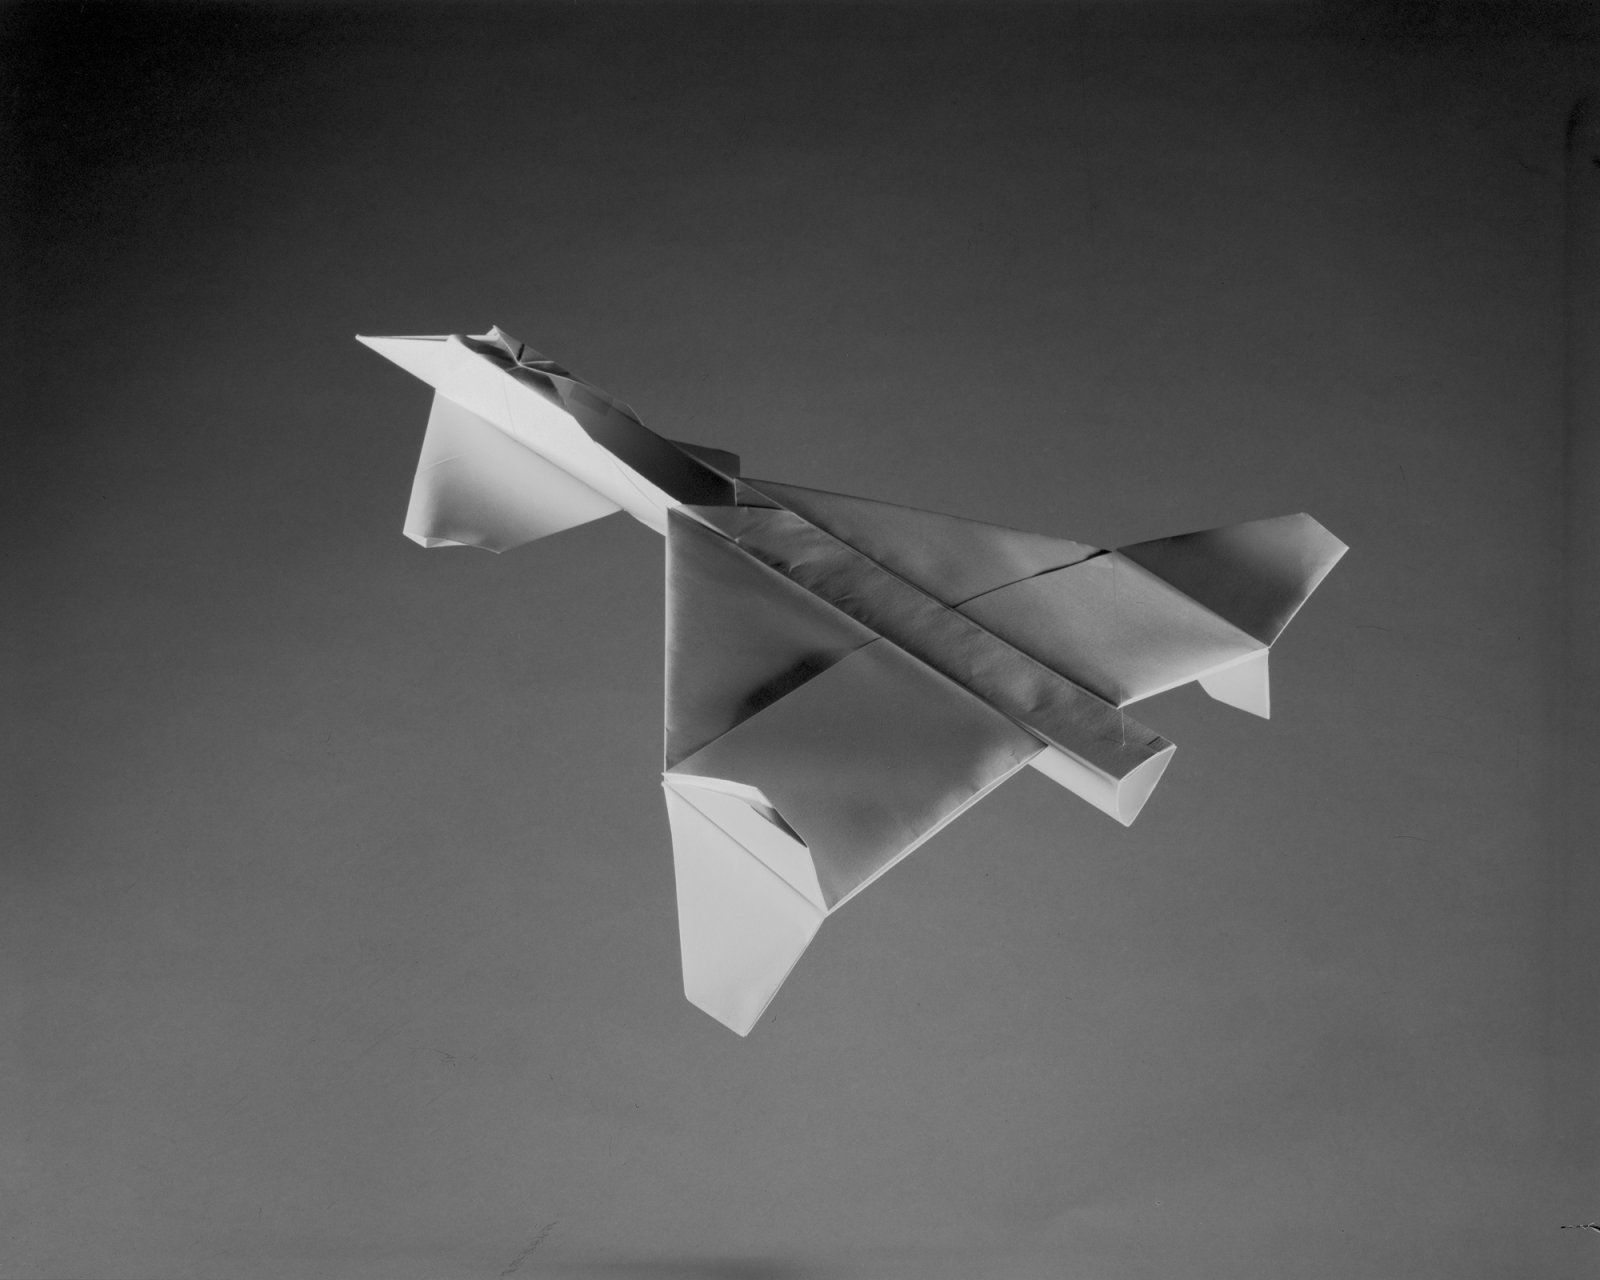 Paper Planes © Sjoerd Knibbeler